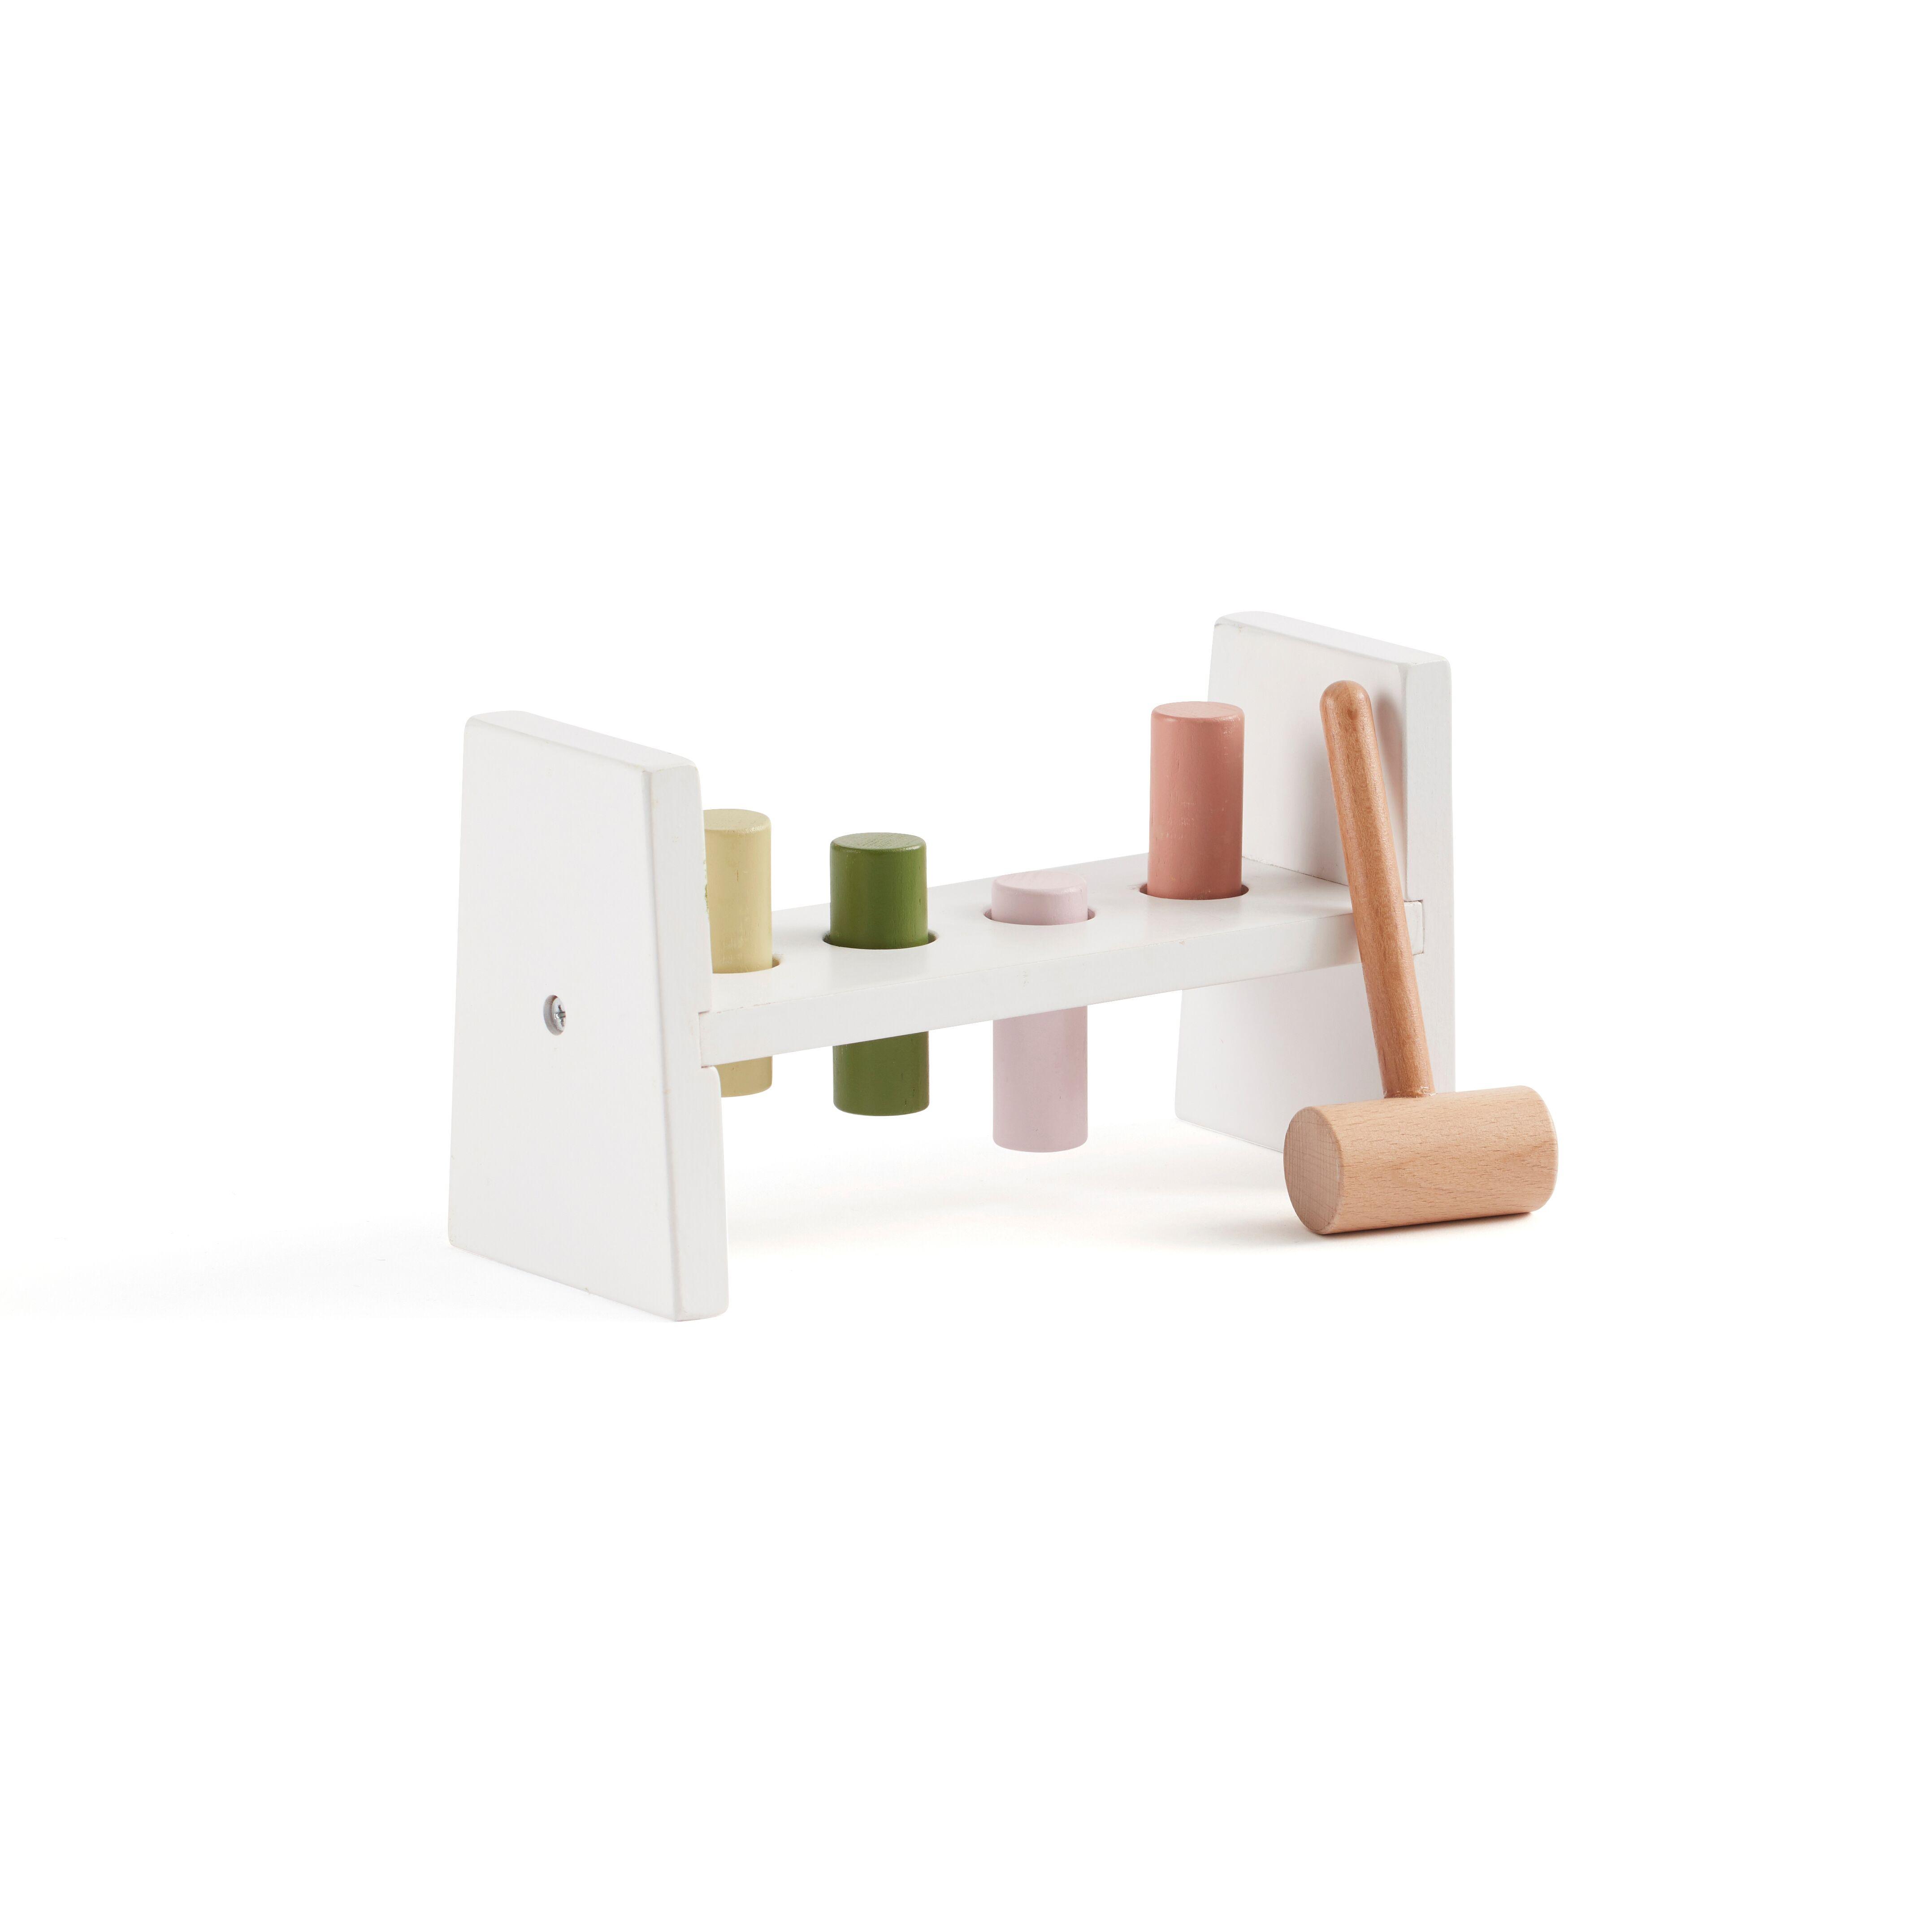 Kids Concept - EDVIN - Hammerbench (1000407)